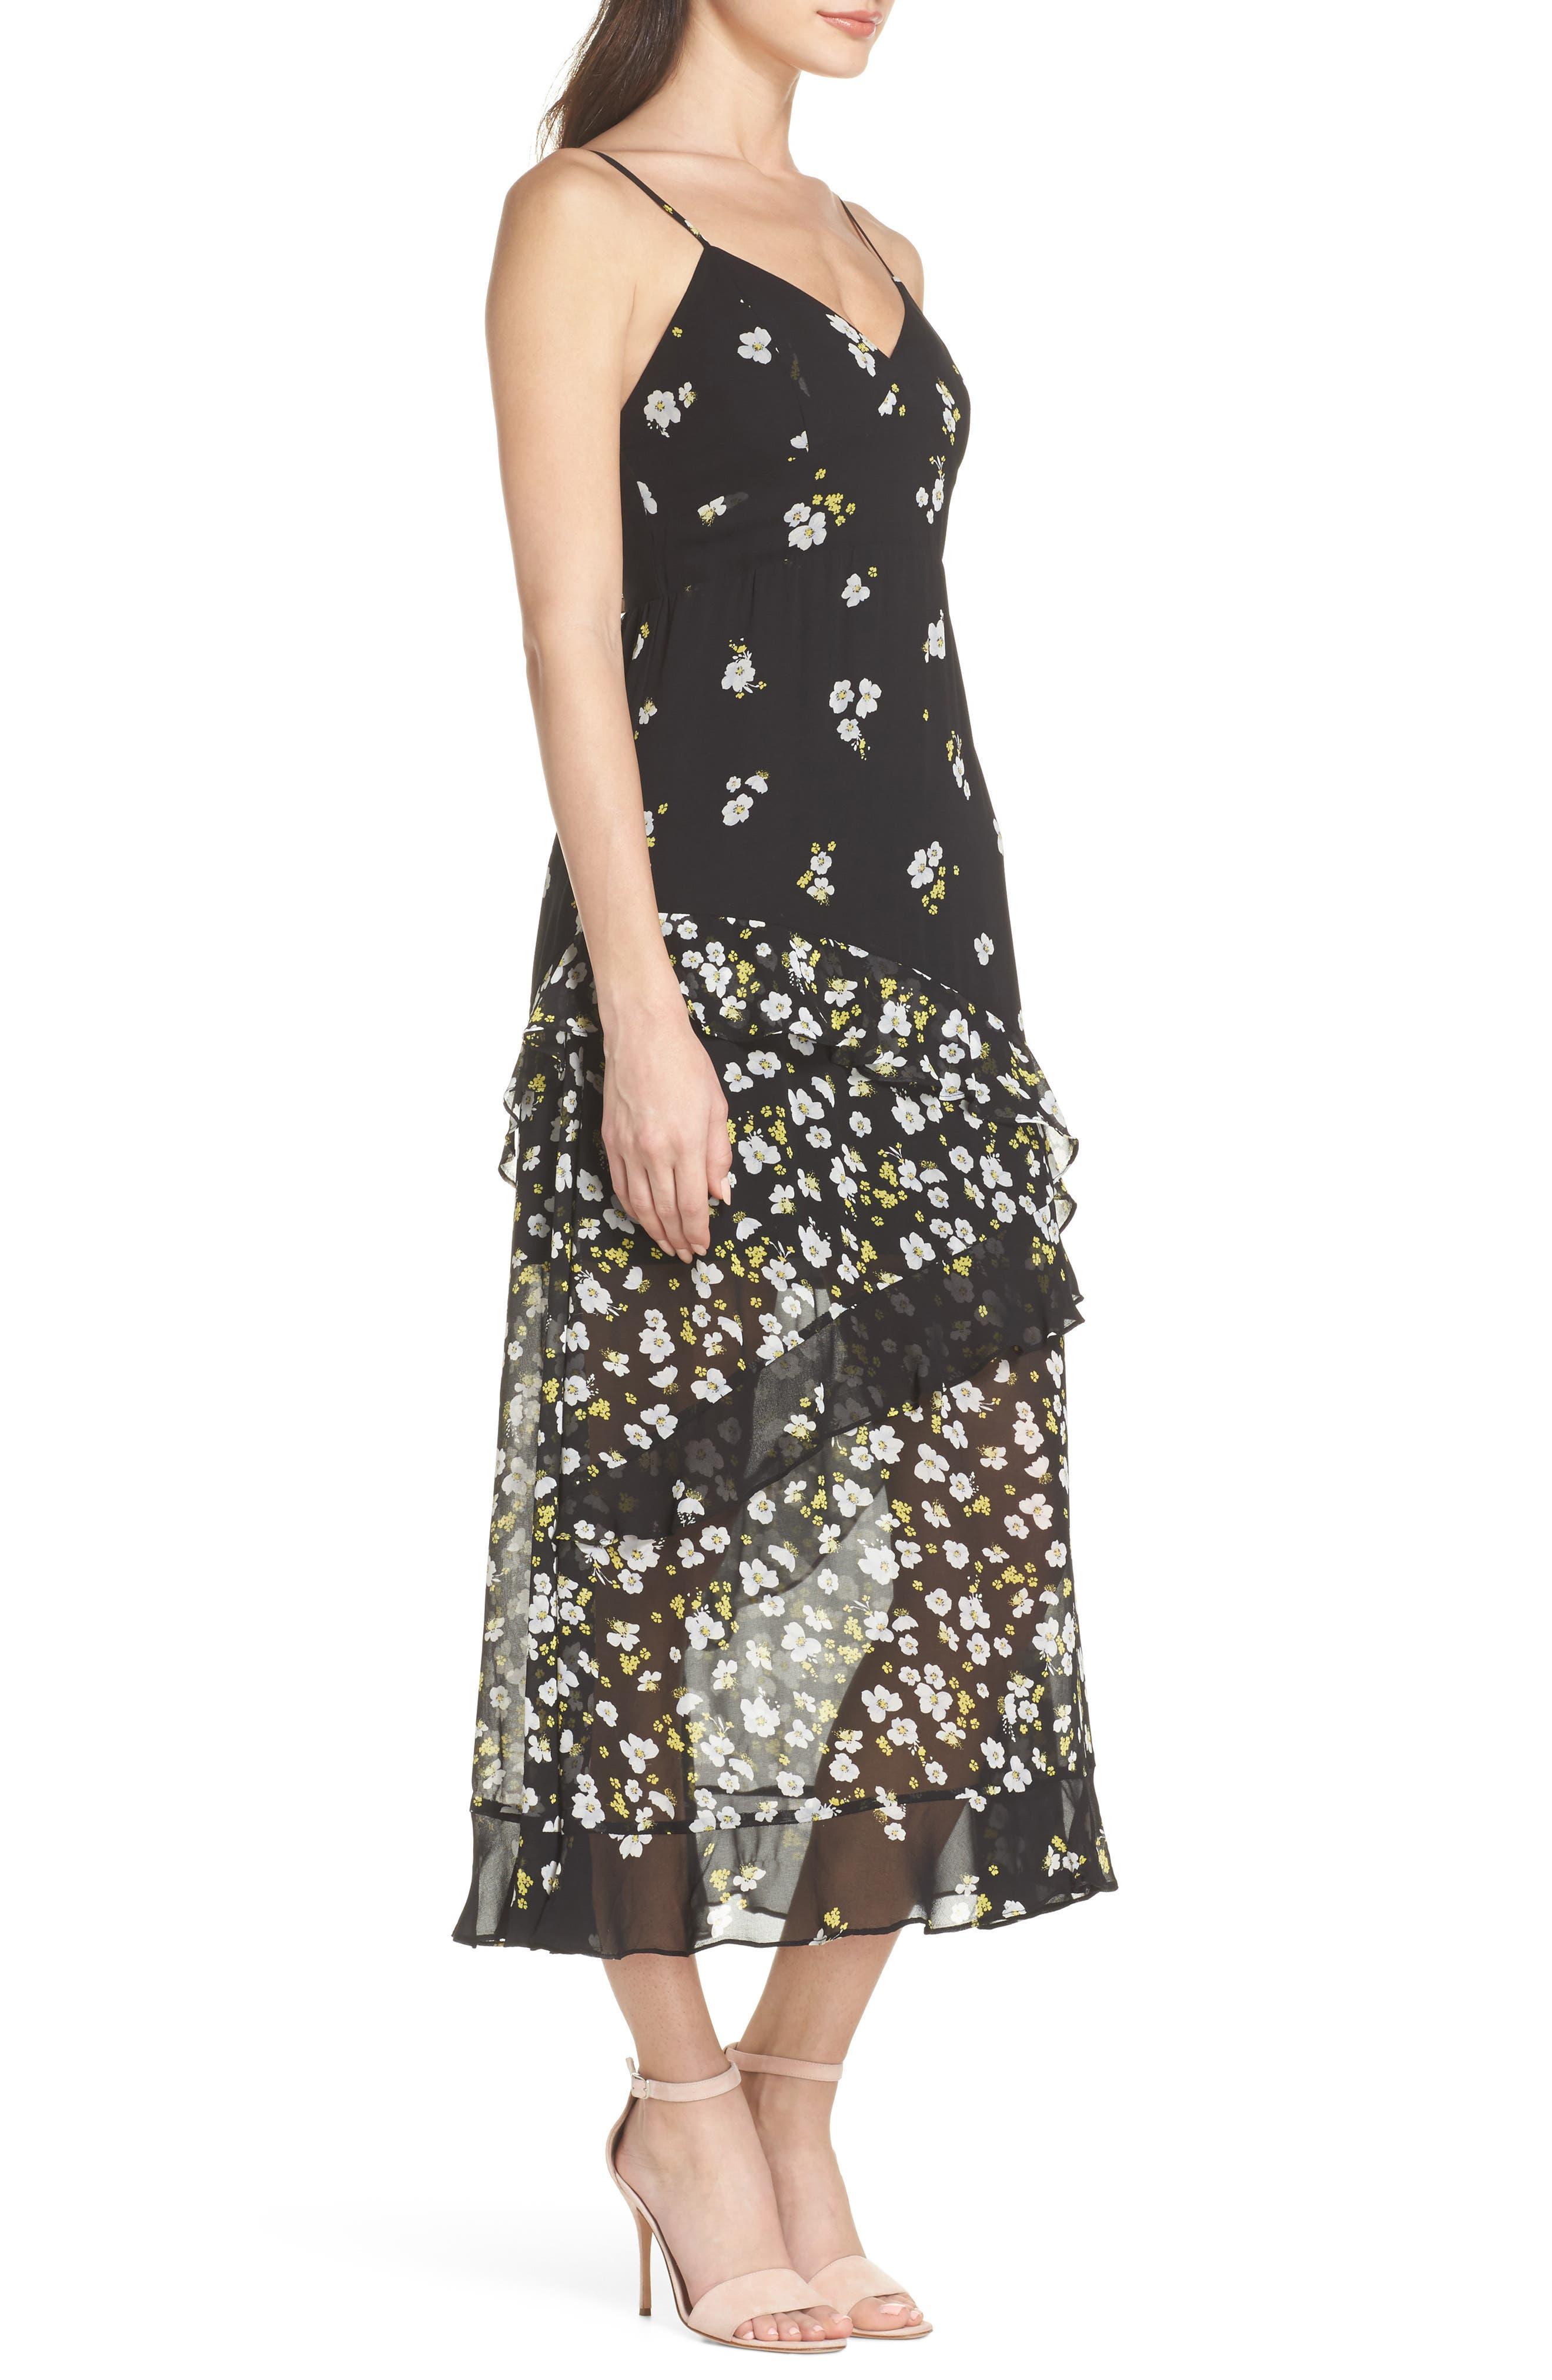 Ditzy Floral & Ruffle Chiffon Dress,                             Alternate thumbnail 3, color,                             001